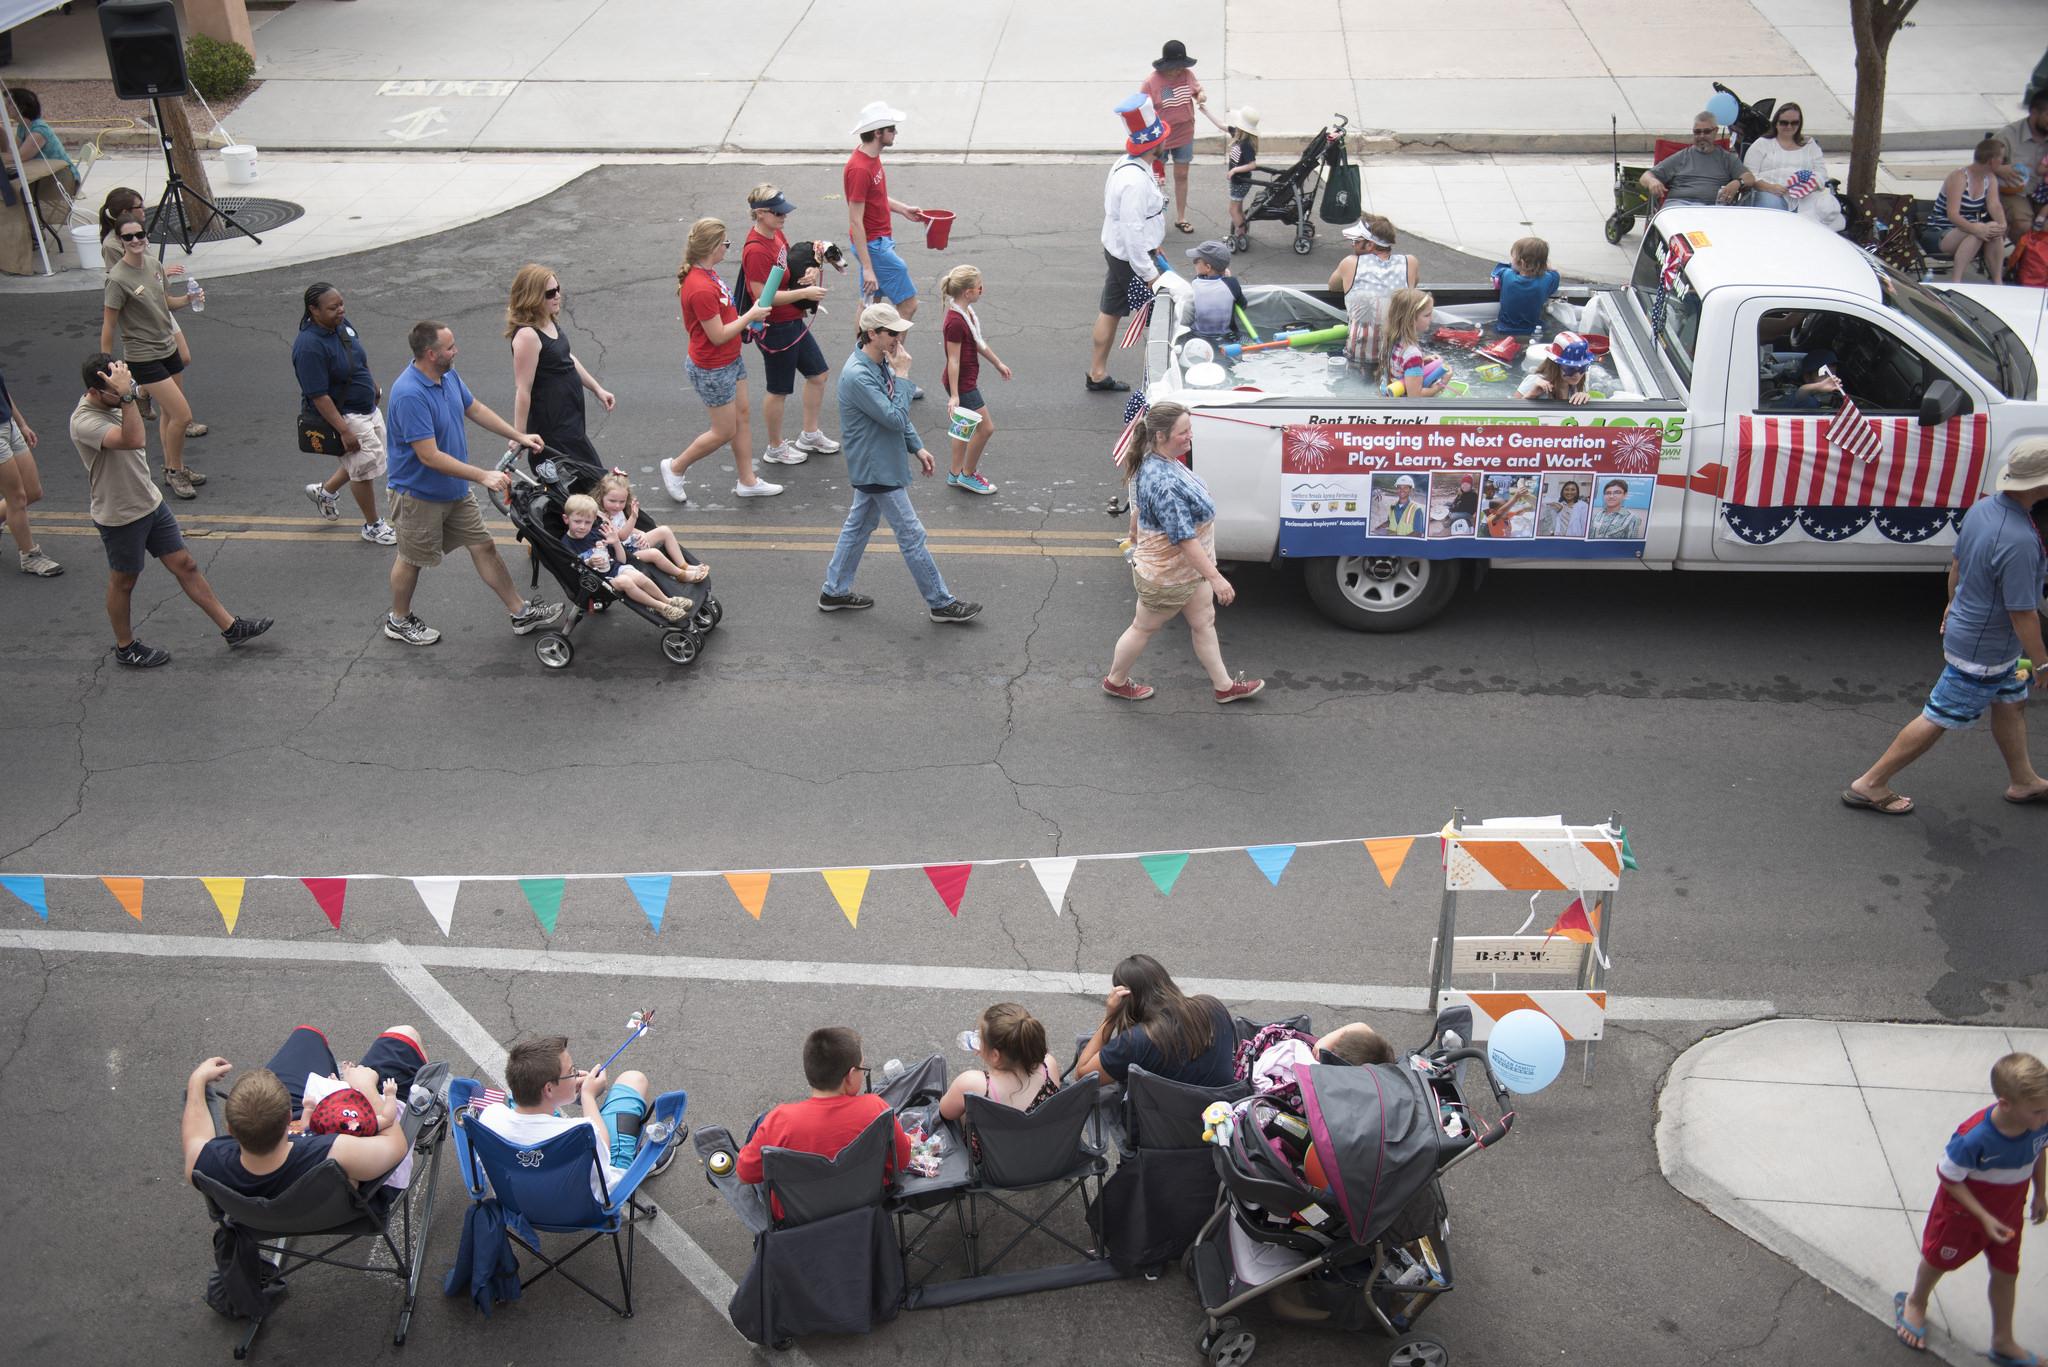 The Fourth of July parade traveled down Nevada Way at the 67th Annual Boulder City Damboree Celebration in Boulder City, Saturday, July 4, 2015.(JASON OGULNIK/BOULDER CITY REVIEW)